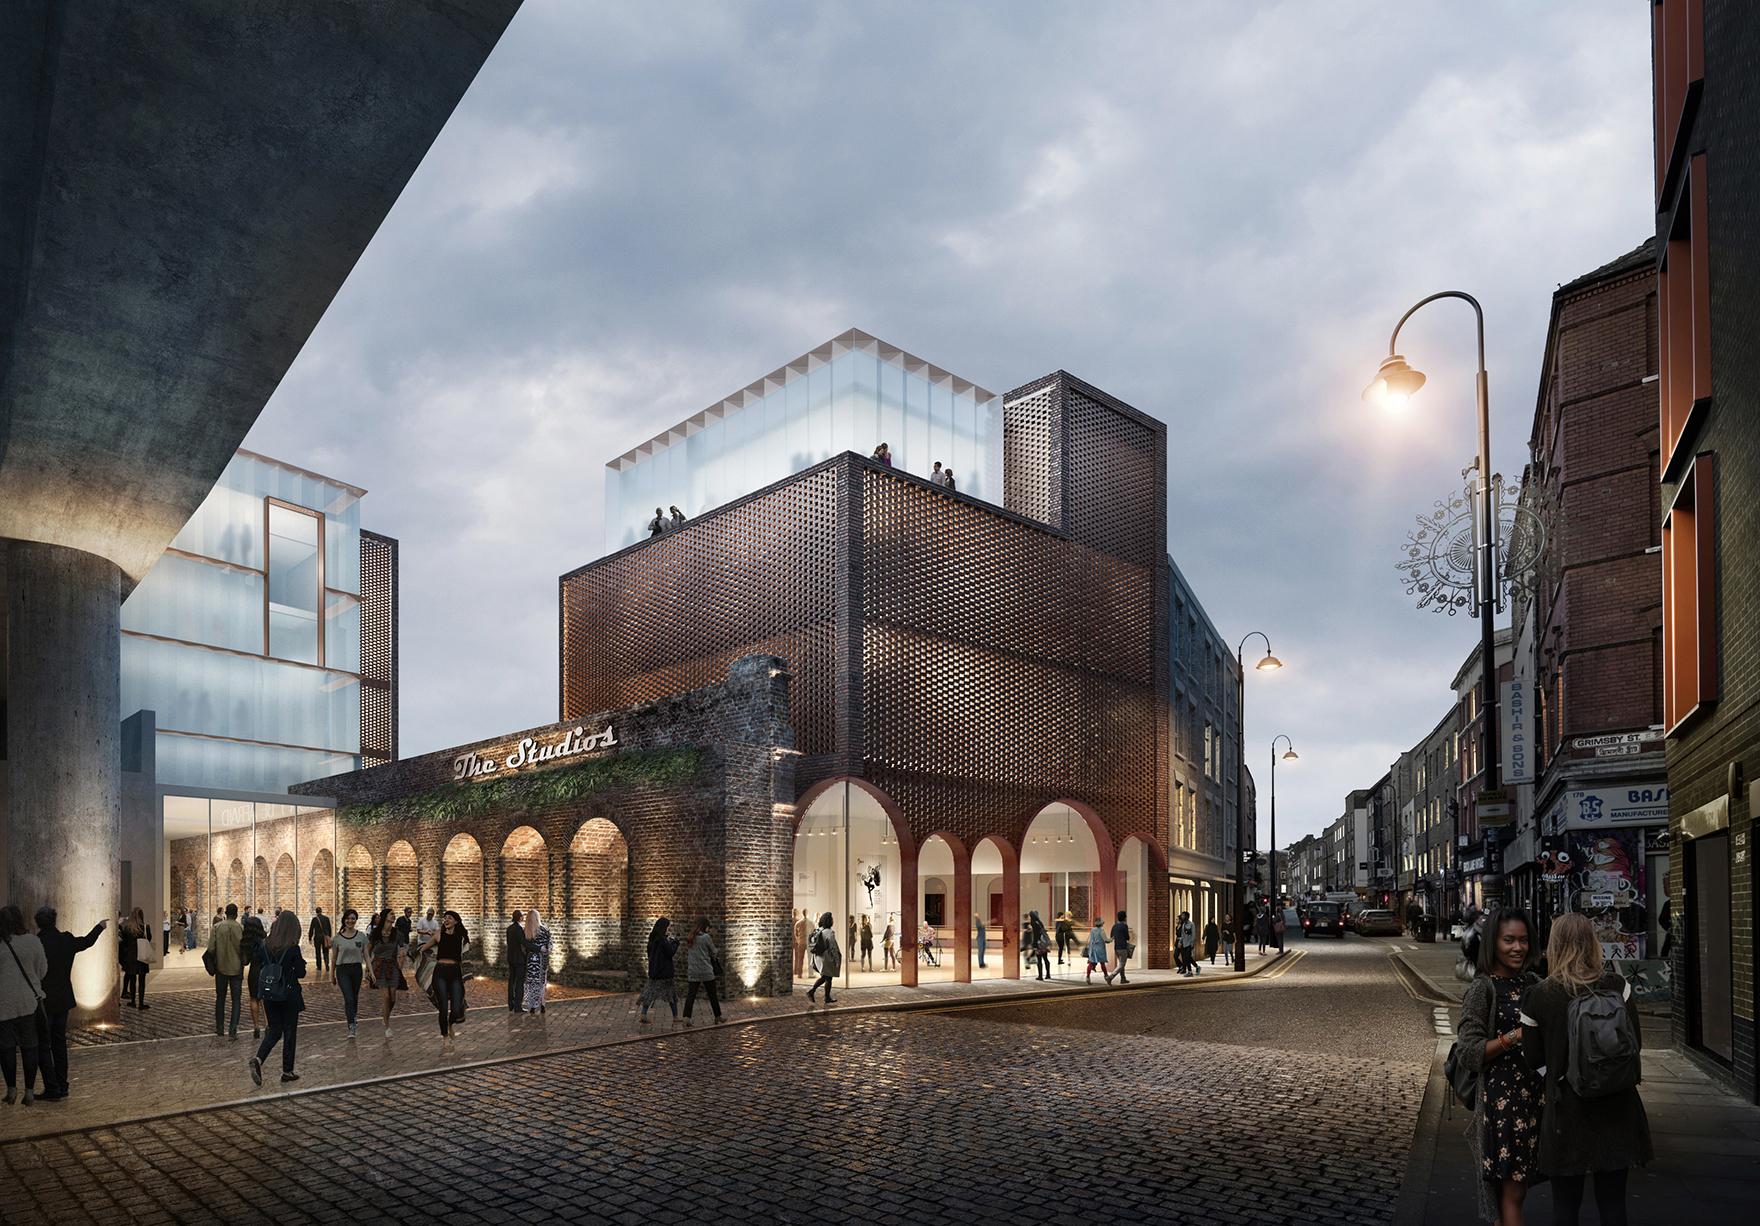 The Goodsyard Mixed Use Masterplan Faulknerbrowns Architects Cultural Building Brick Lane Lh